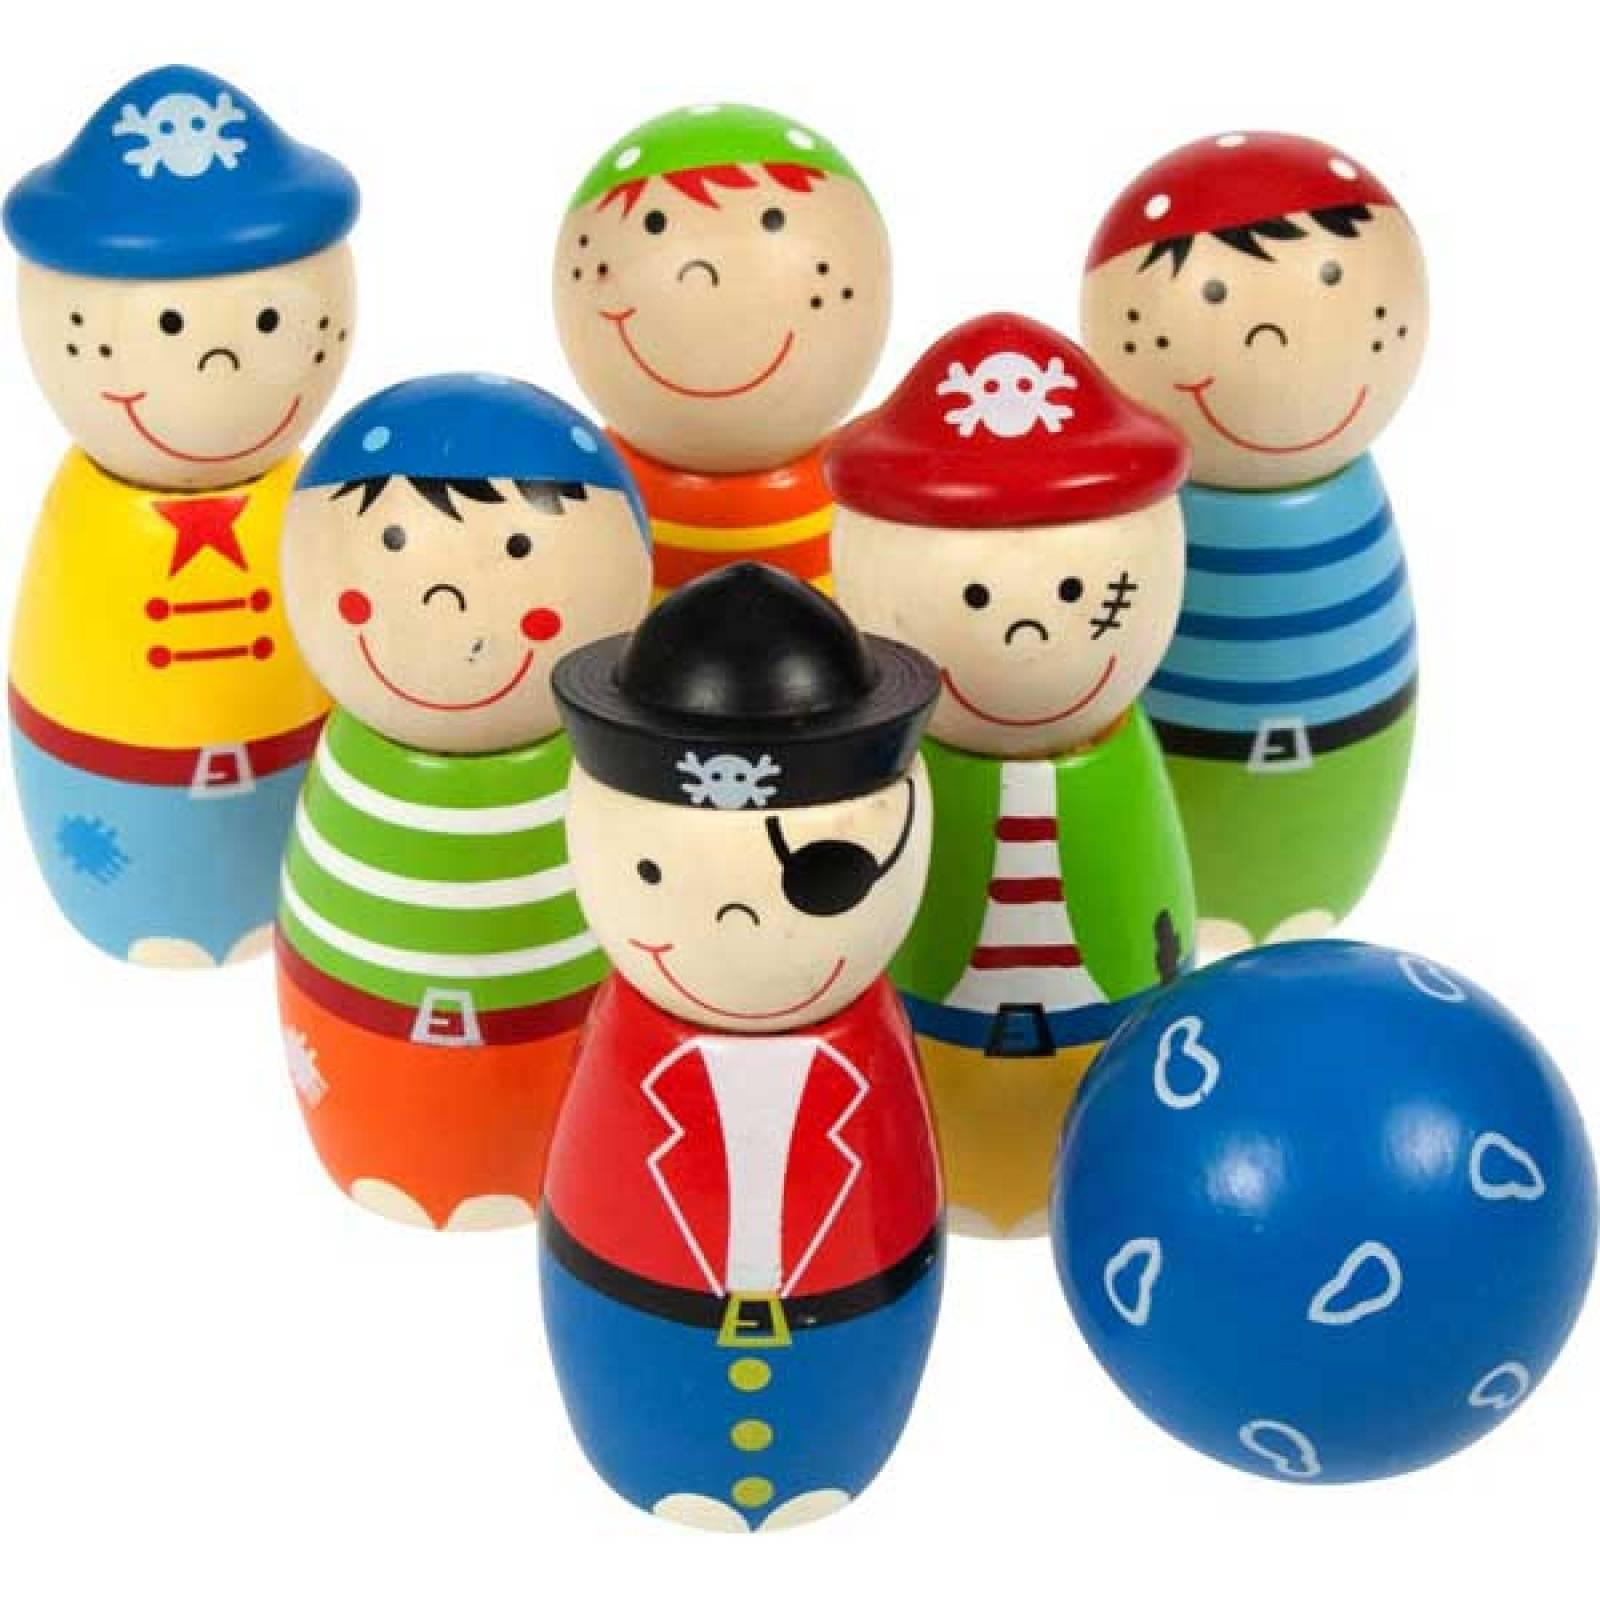 Pirate Skittles - 8cm - 3yrs+